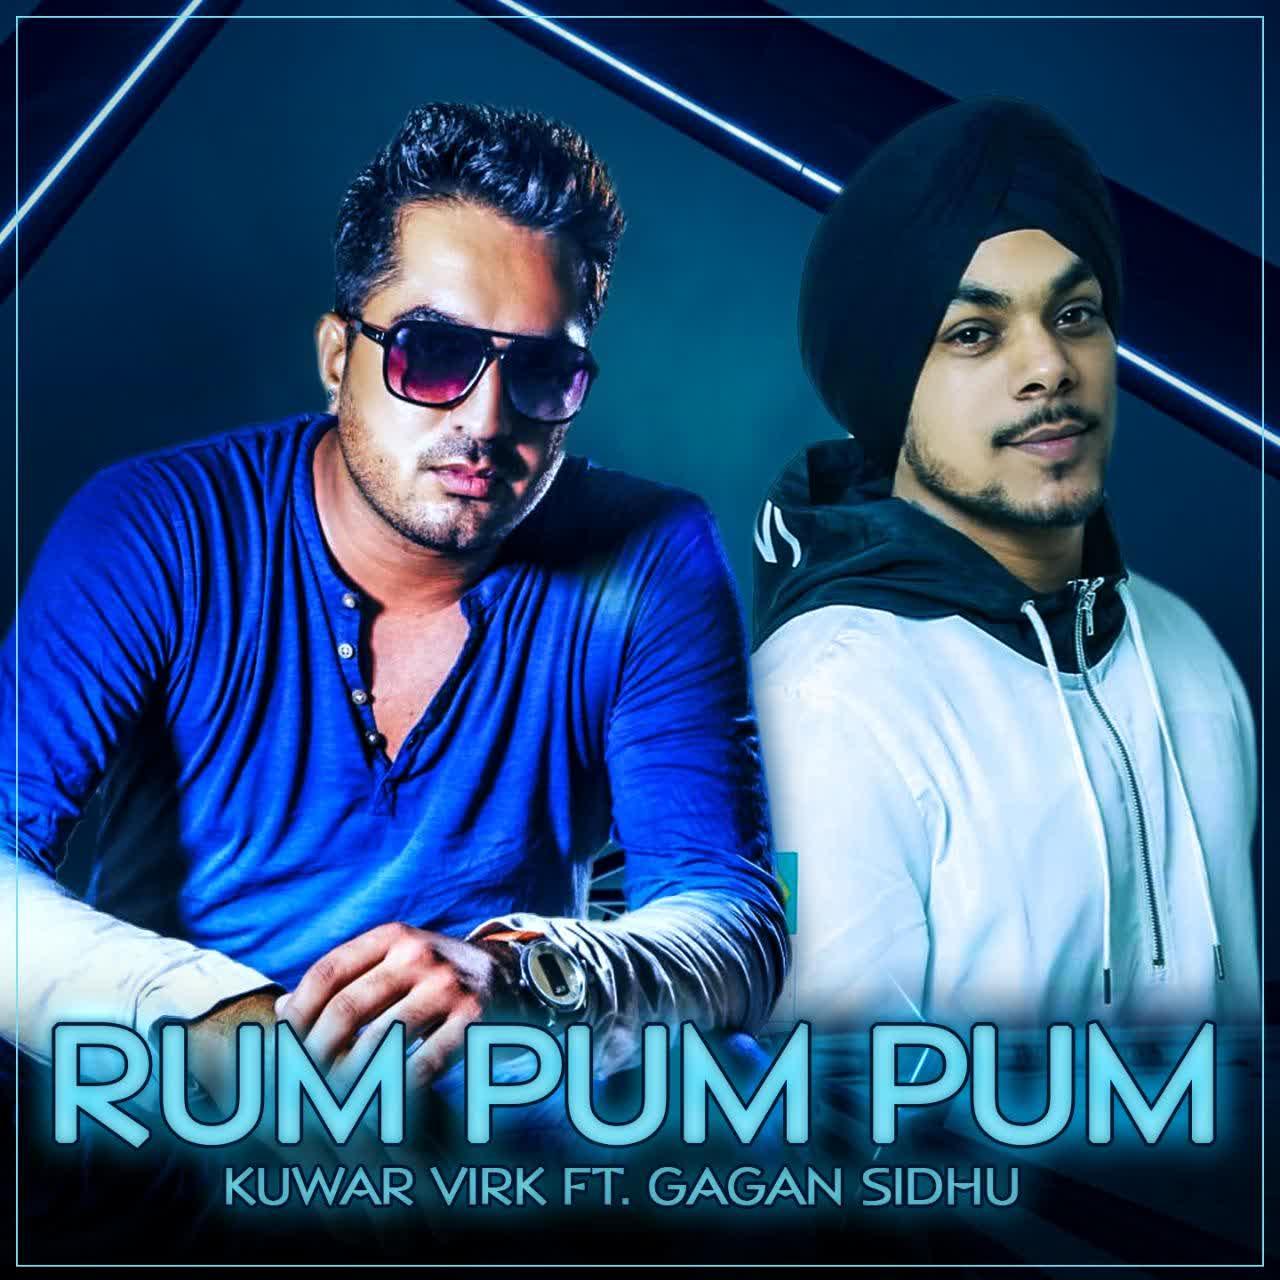 https://cover.djpunjab.org/43884/300x250/Rum_Pum_Pum_Gagan_Sidhu.jpg